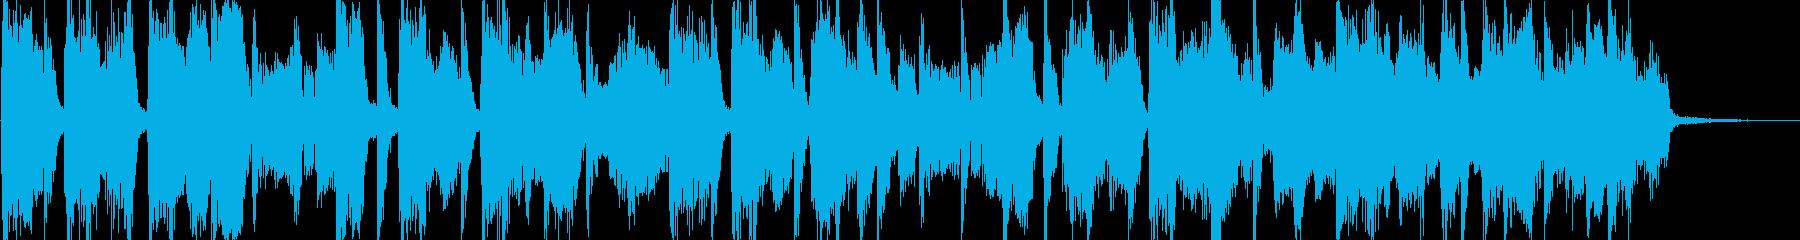 R&B風の短いポップジングルの再生済みの波形